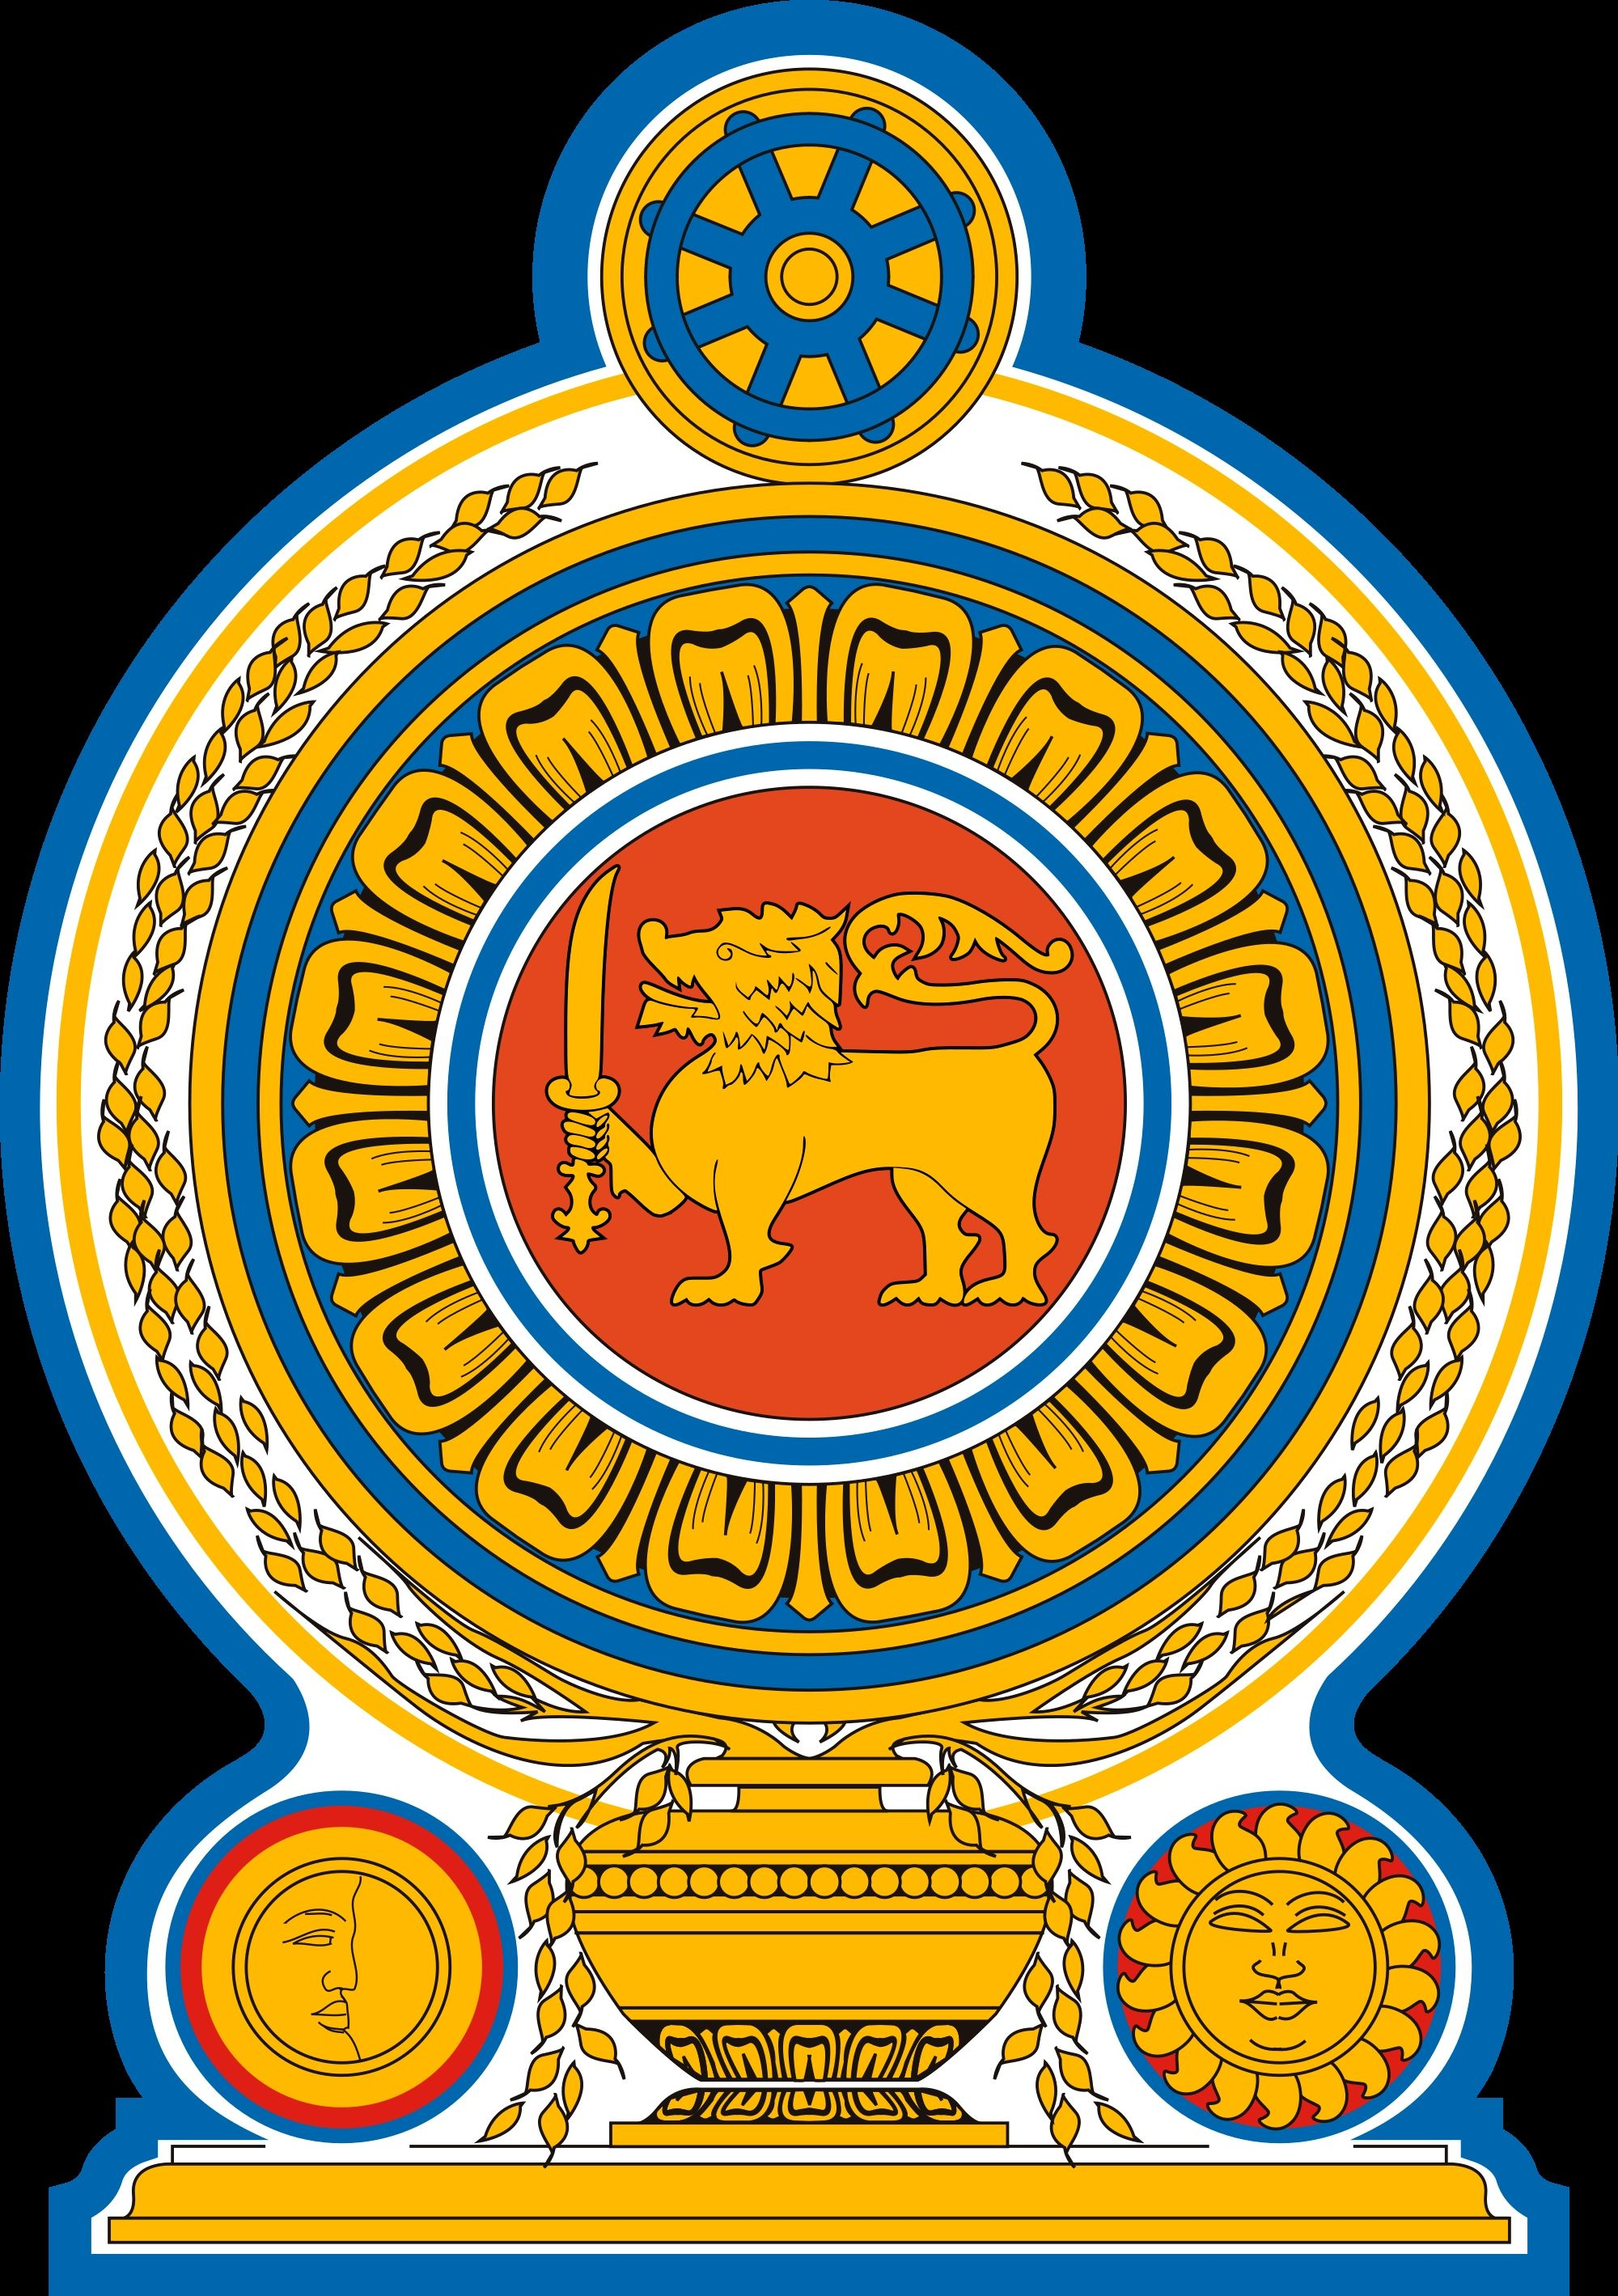 Pin By Peru On Peru Photographyy Coat Of Arms Sri Lanka Emblems